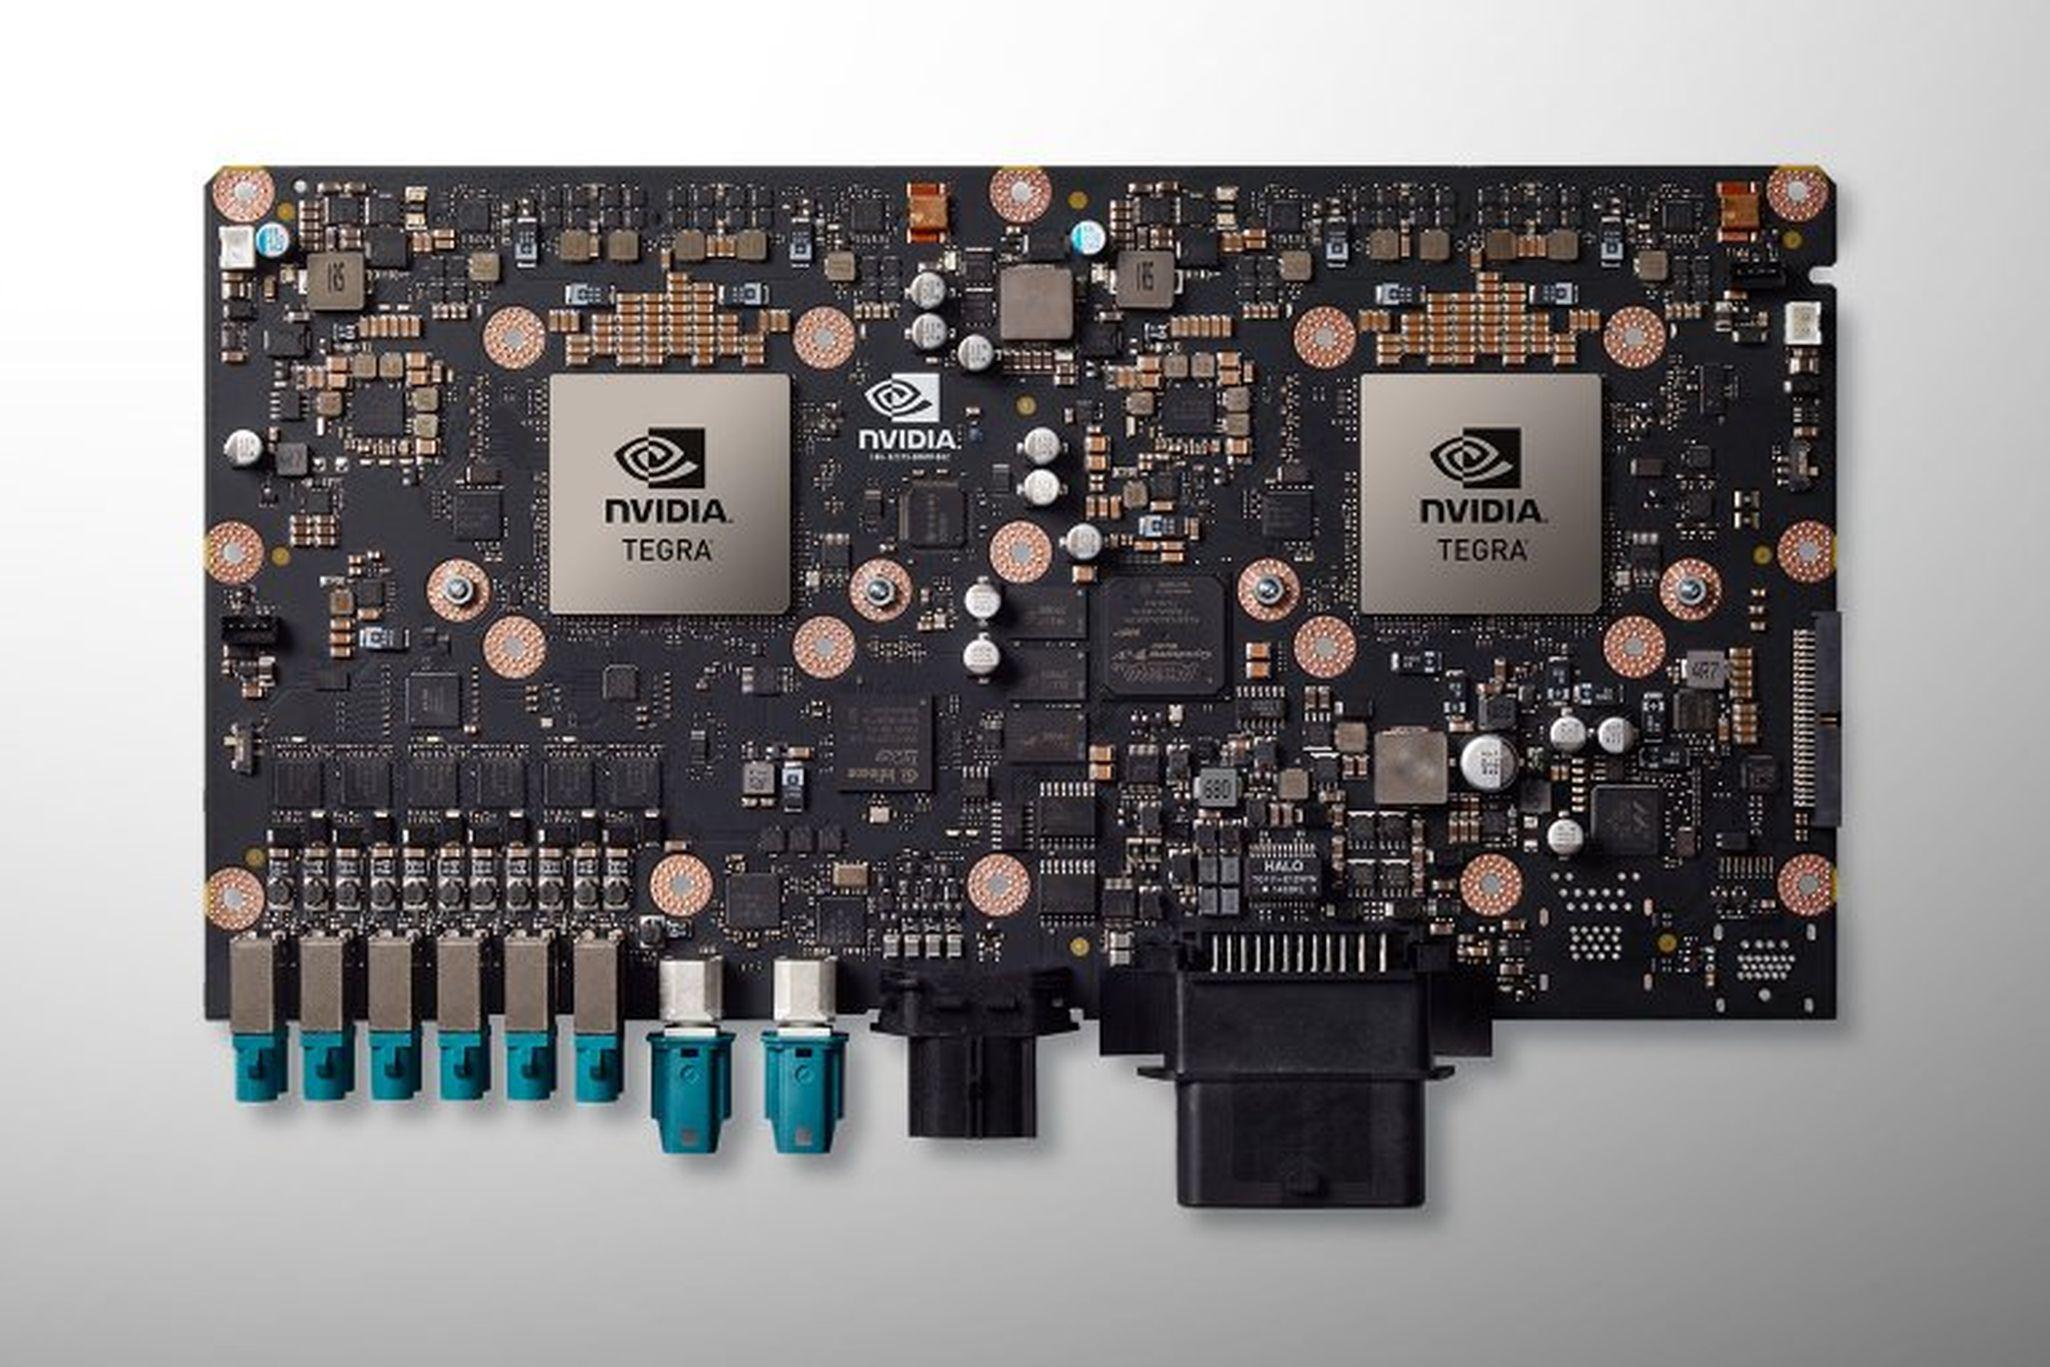 nvidia-drive-px2-050116